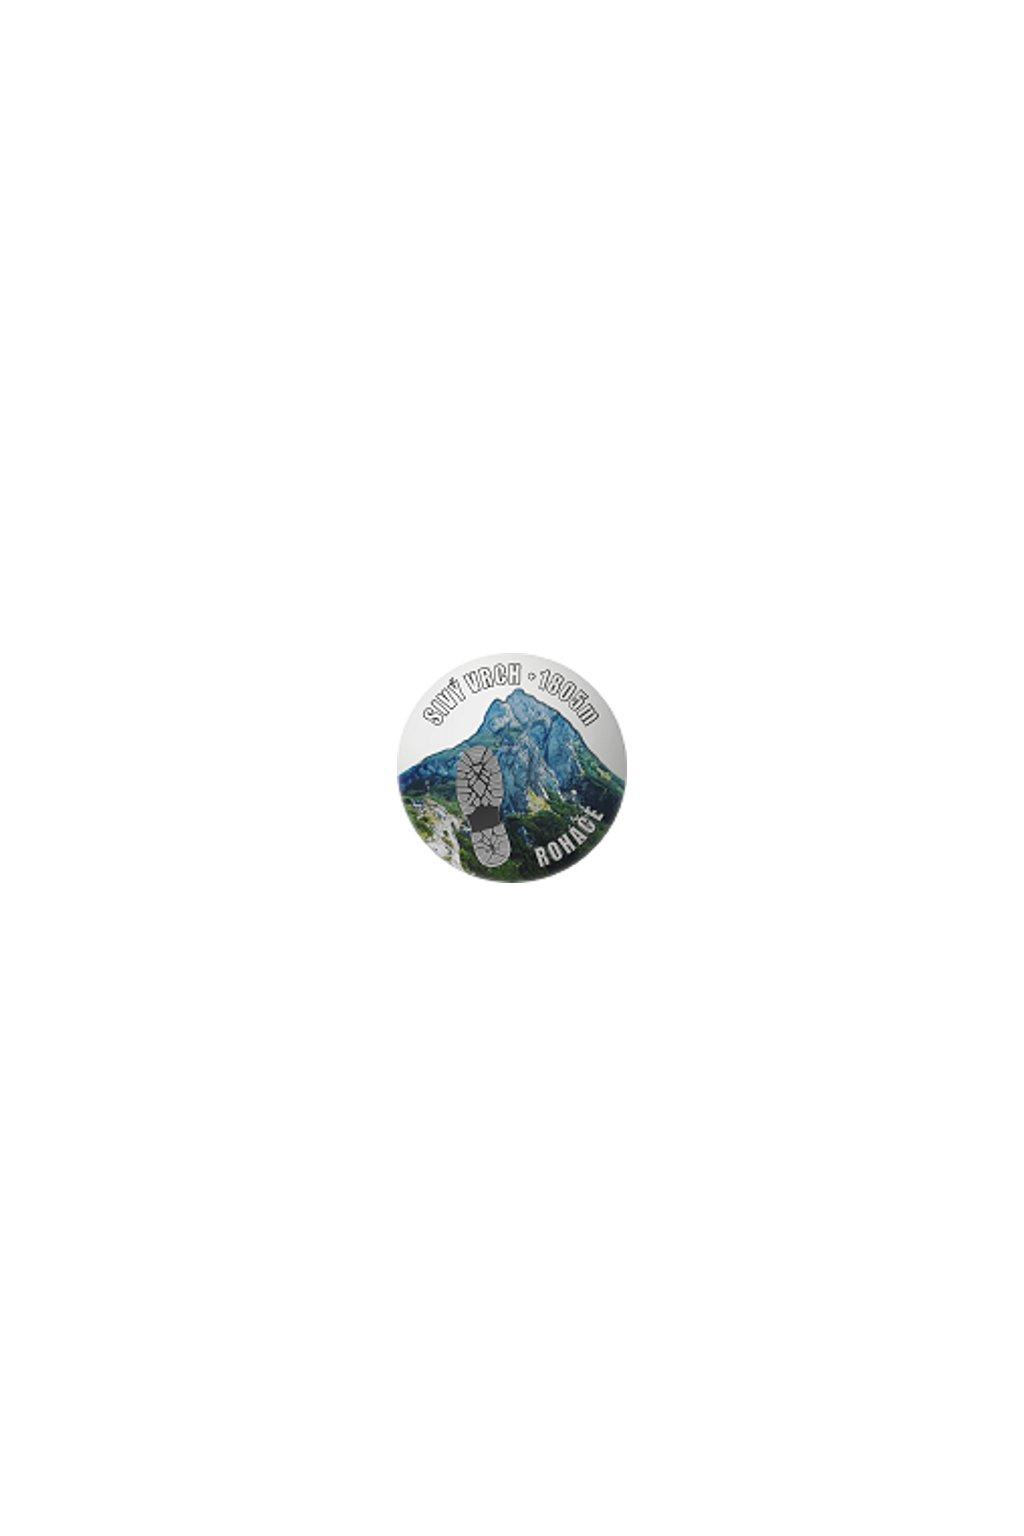 odznak sk sivy vrch01